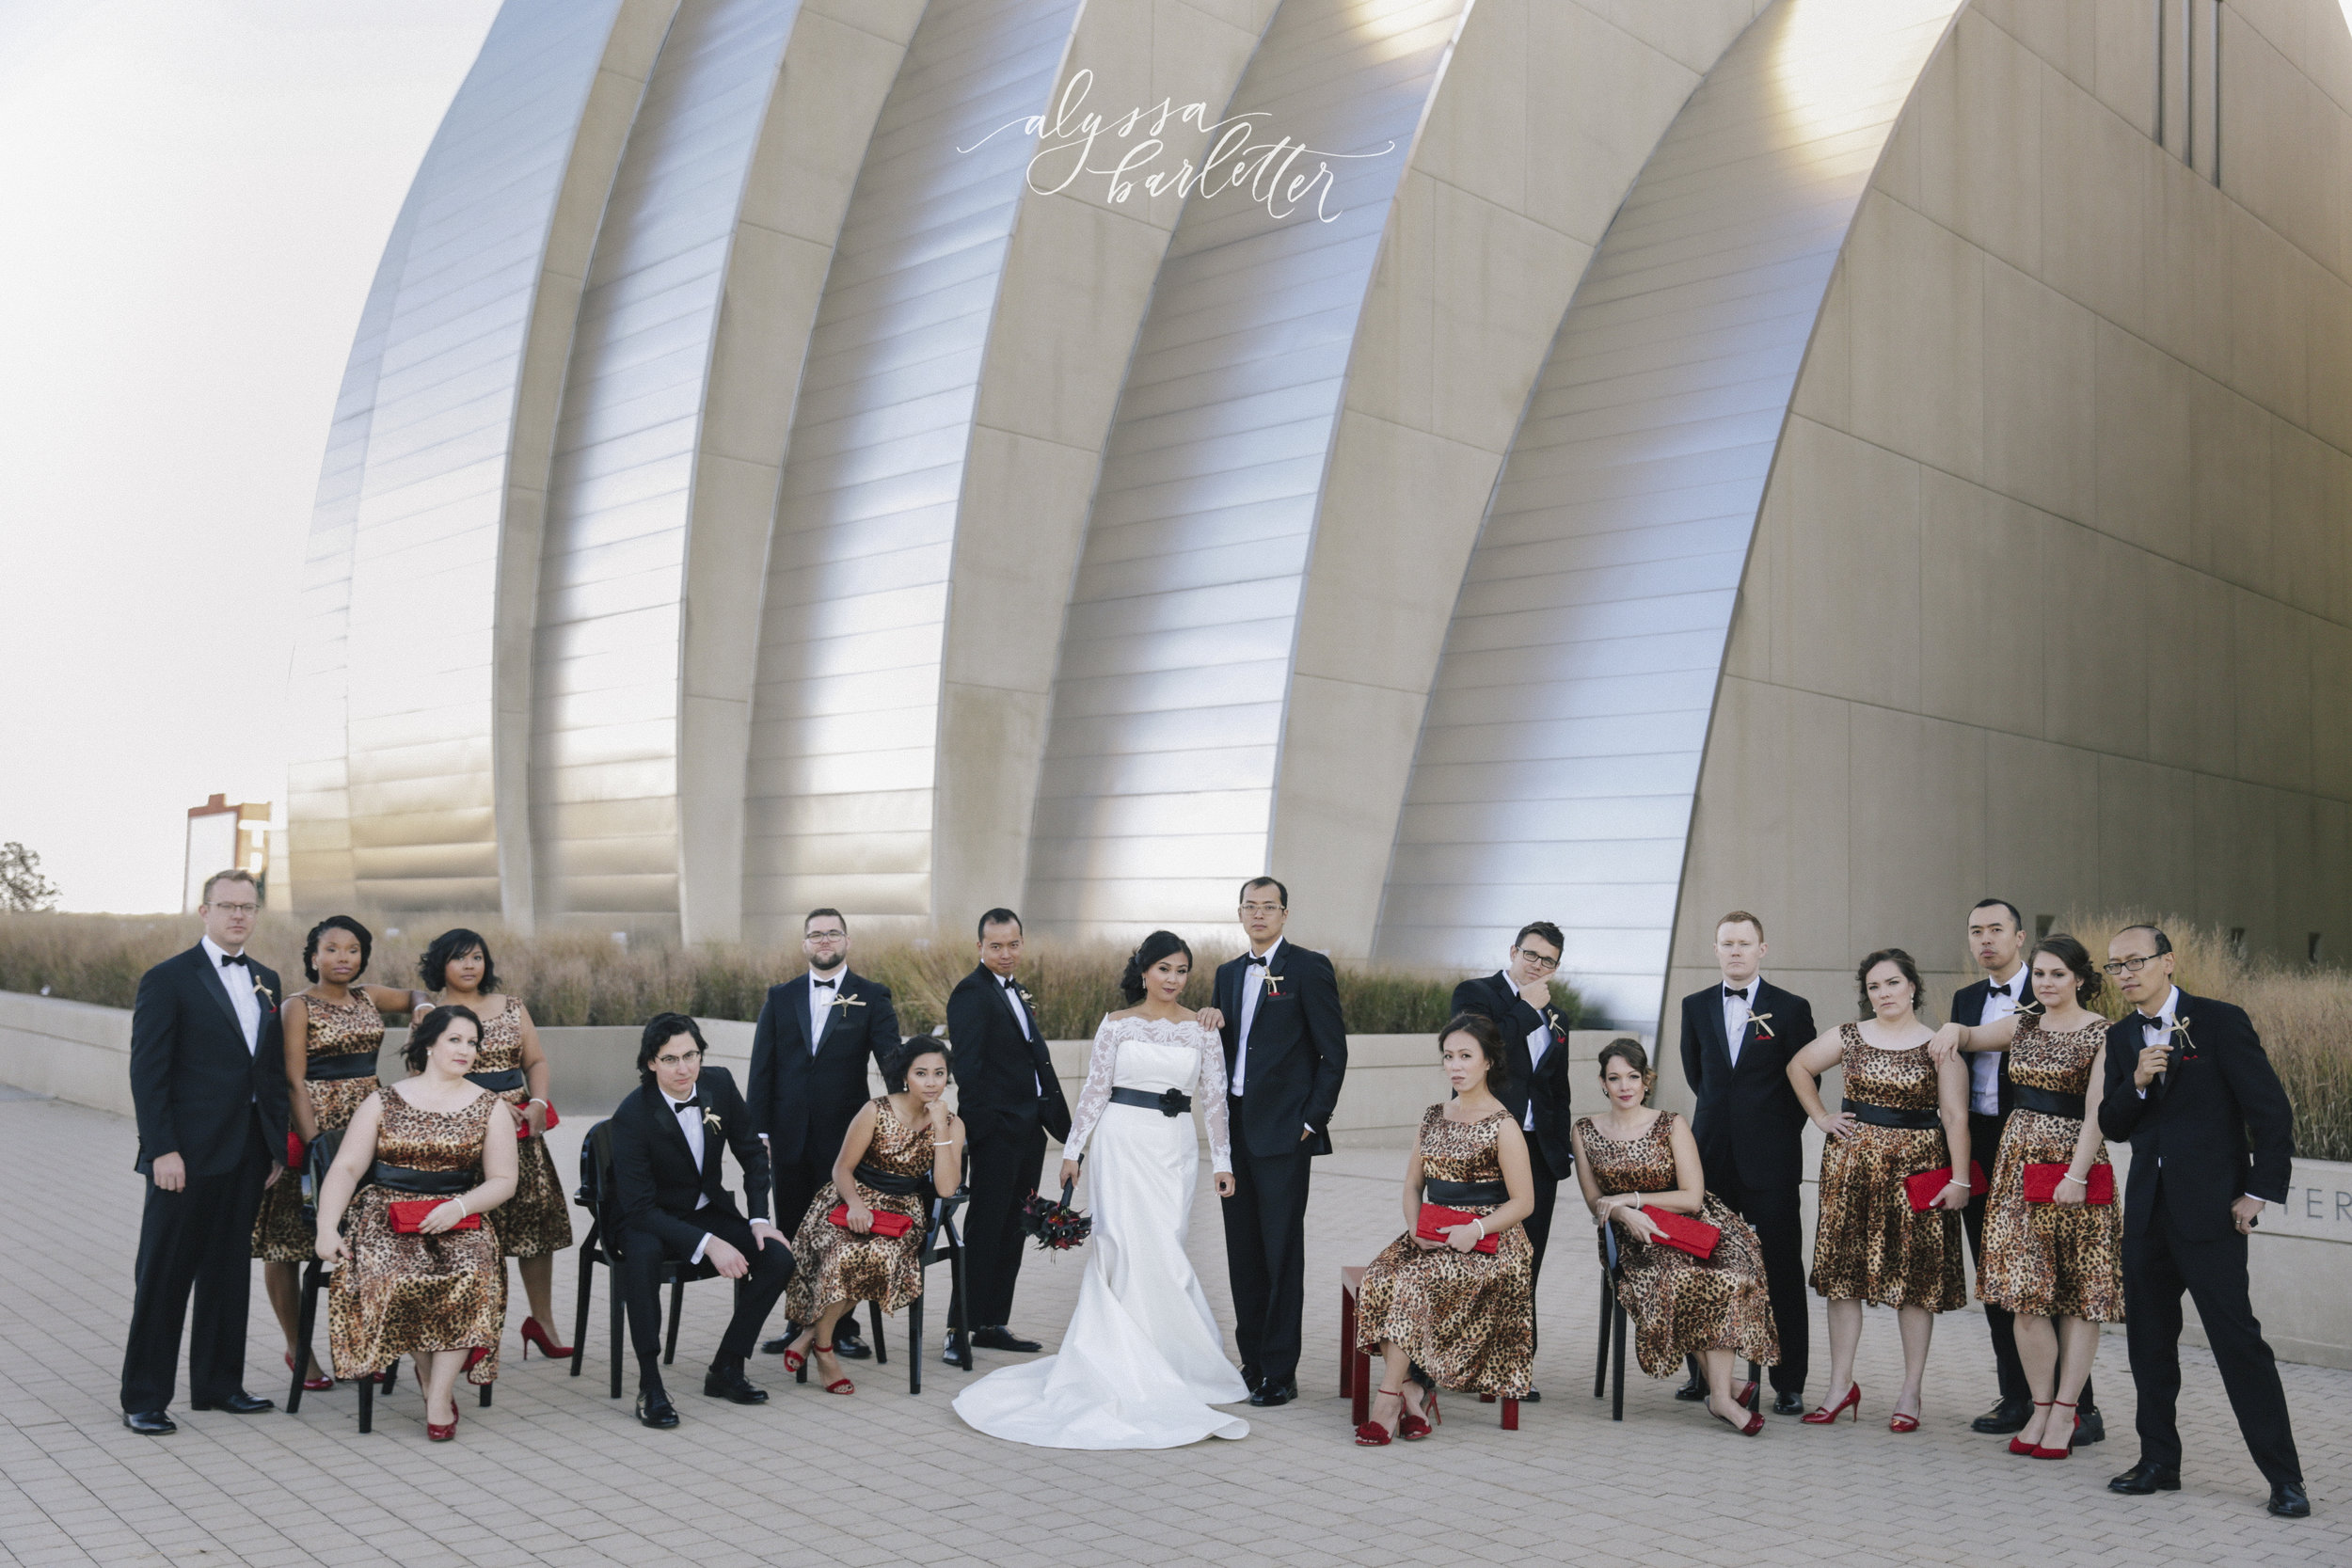 alyssa barletter photography union station wedding photos leopard print winter wedding-1-24.jpg